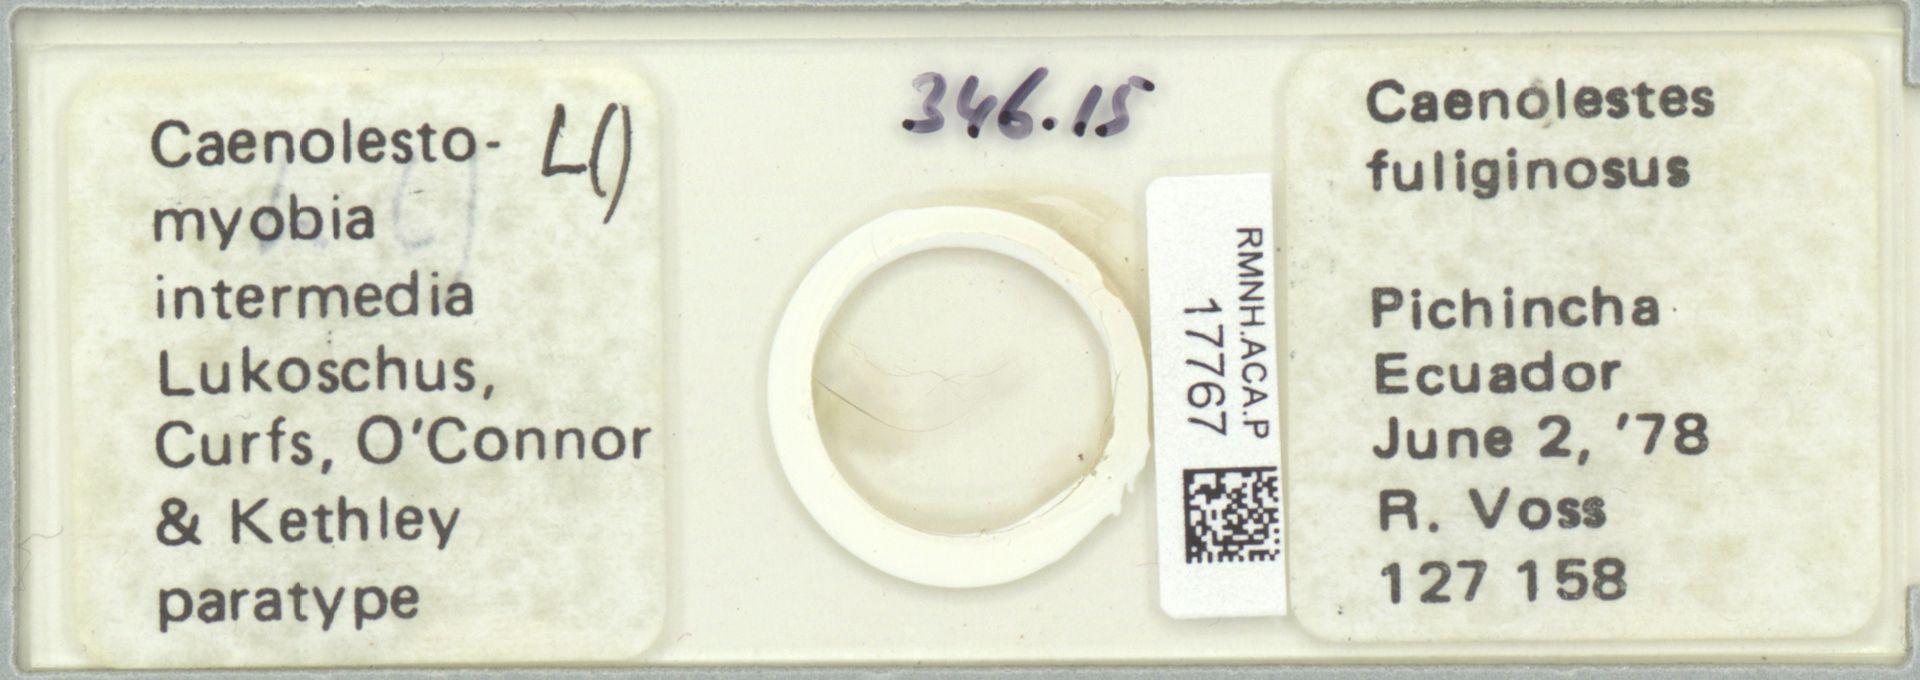 RMNH.ACA.P.17767 | Caenolestomyobia intermedia